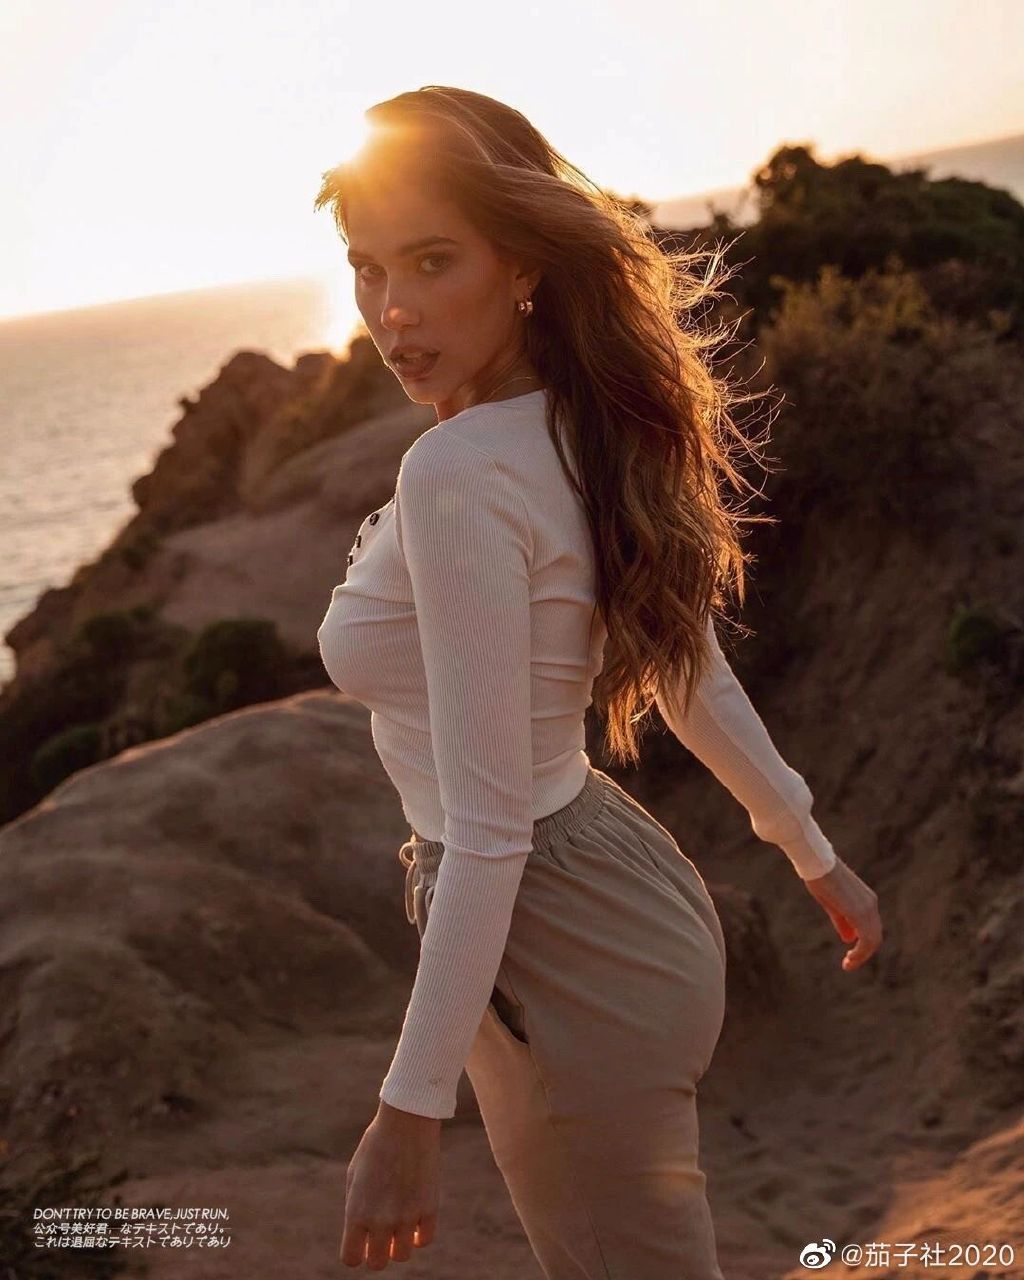 Kara Del Toro 的巨乳会不会被定义为色情低俗 涨姿势 热图7